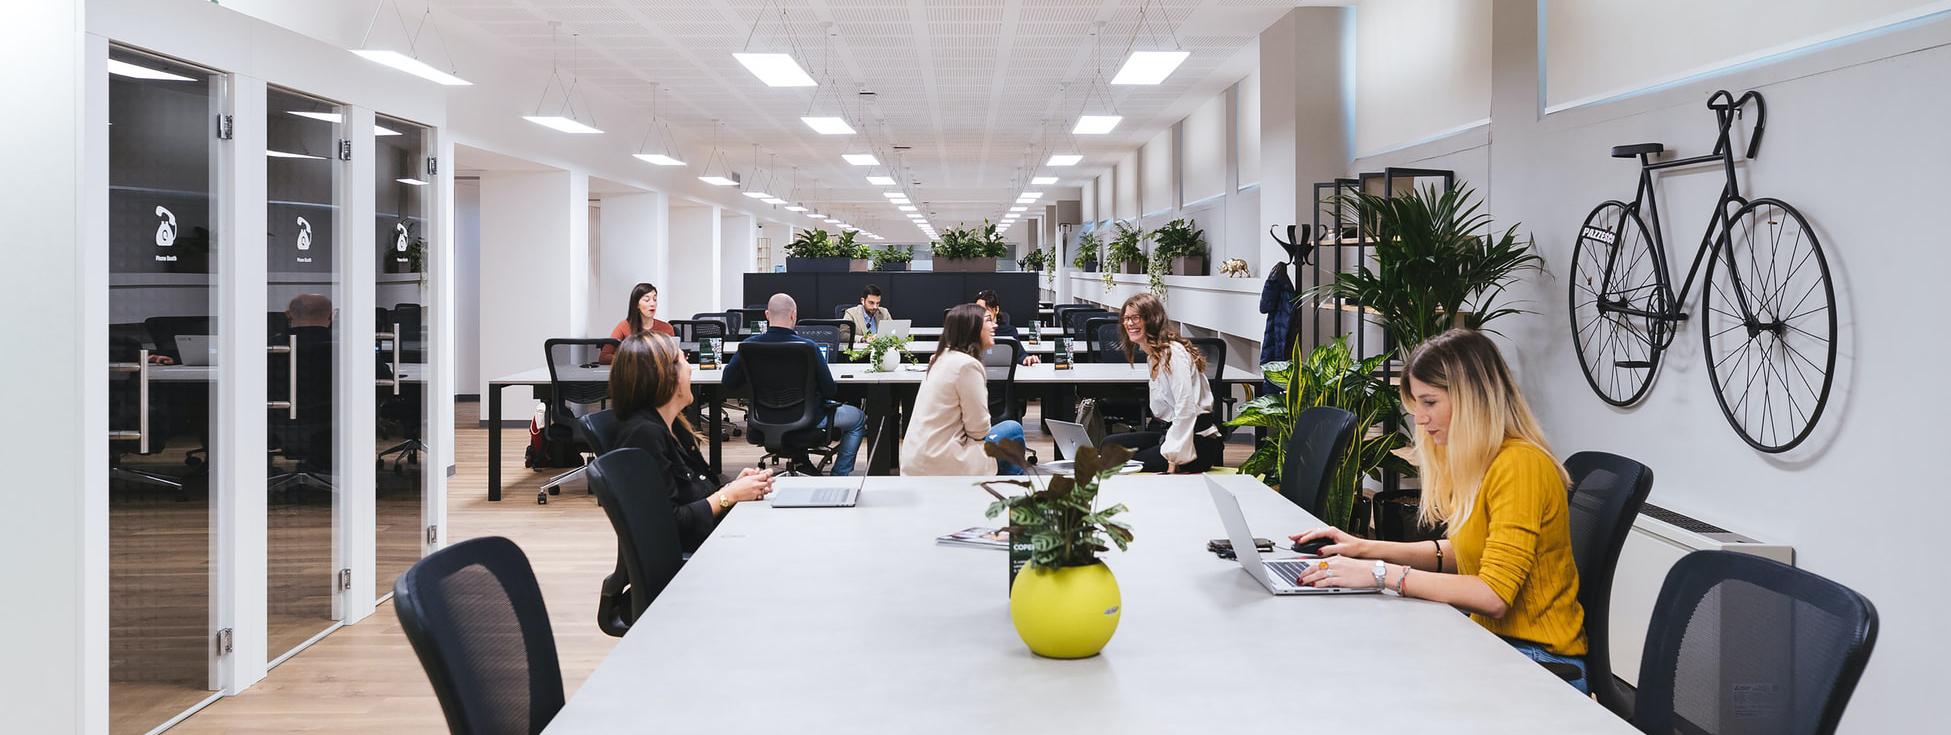 ultrawide-office-meeting